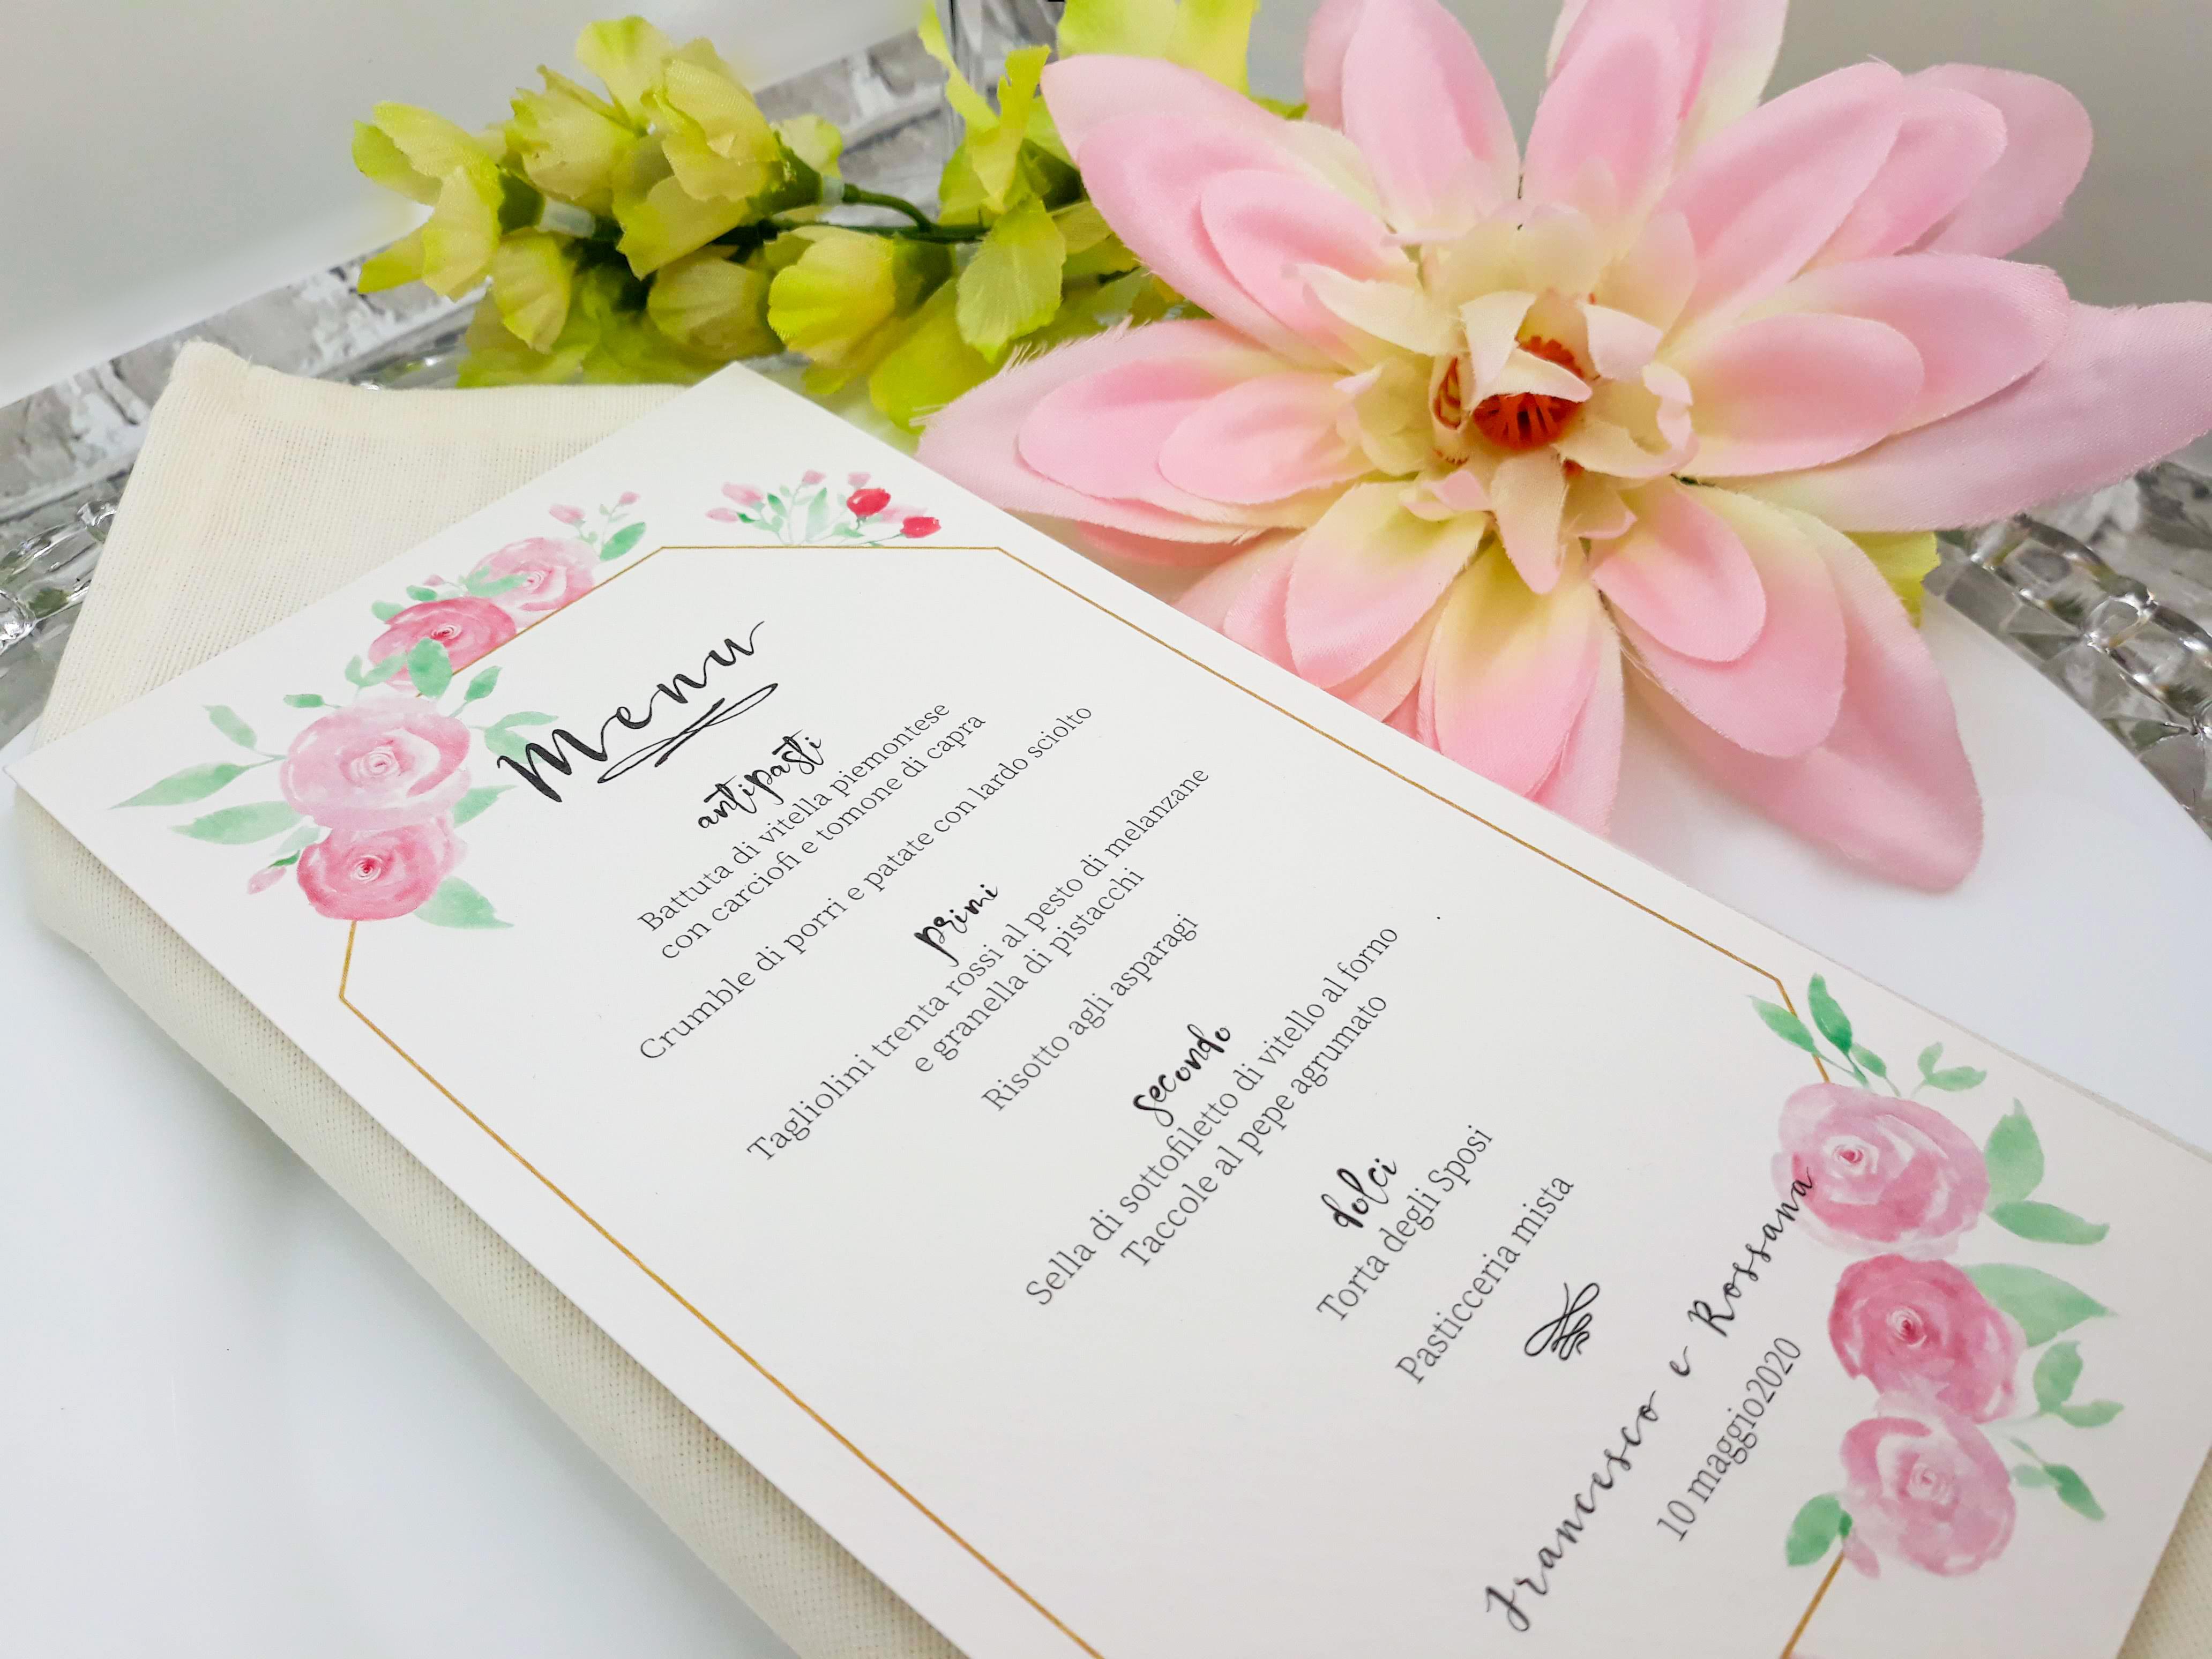 Menu Acquarello fiori nozze rosa Suite Grafica Matrimonio coordinato